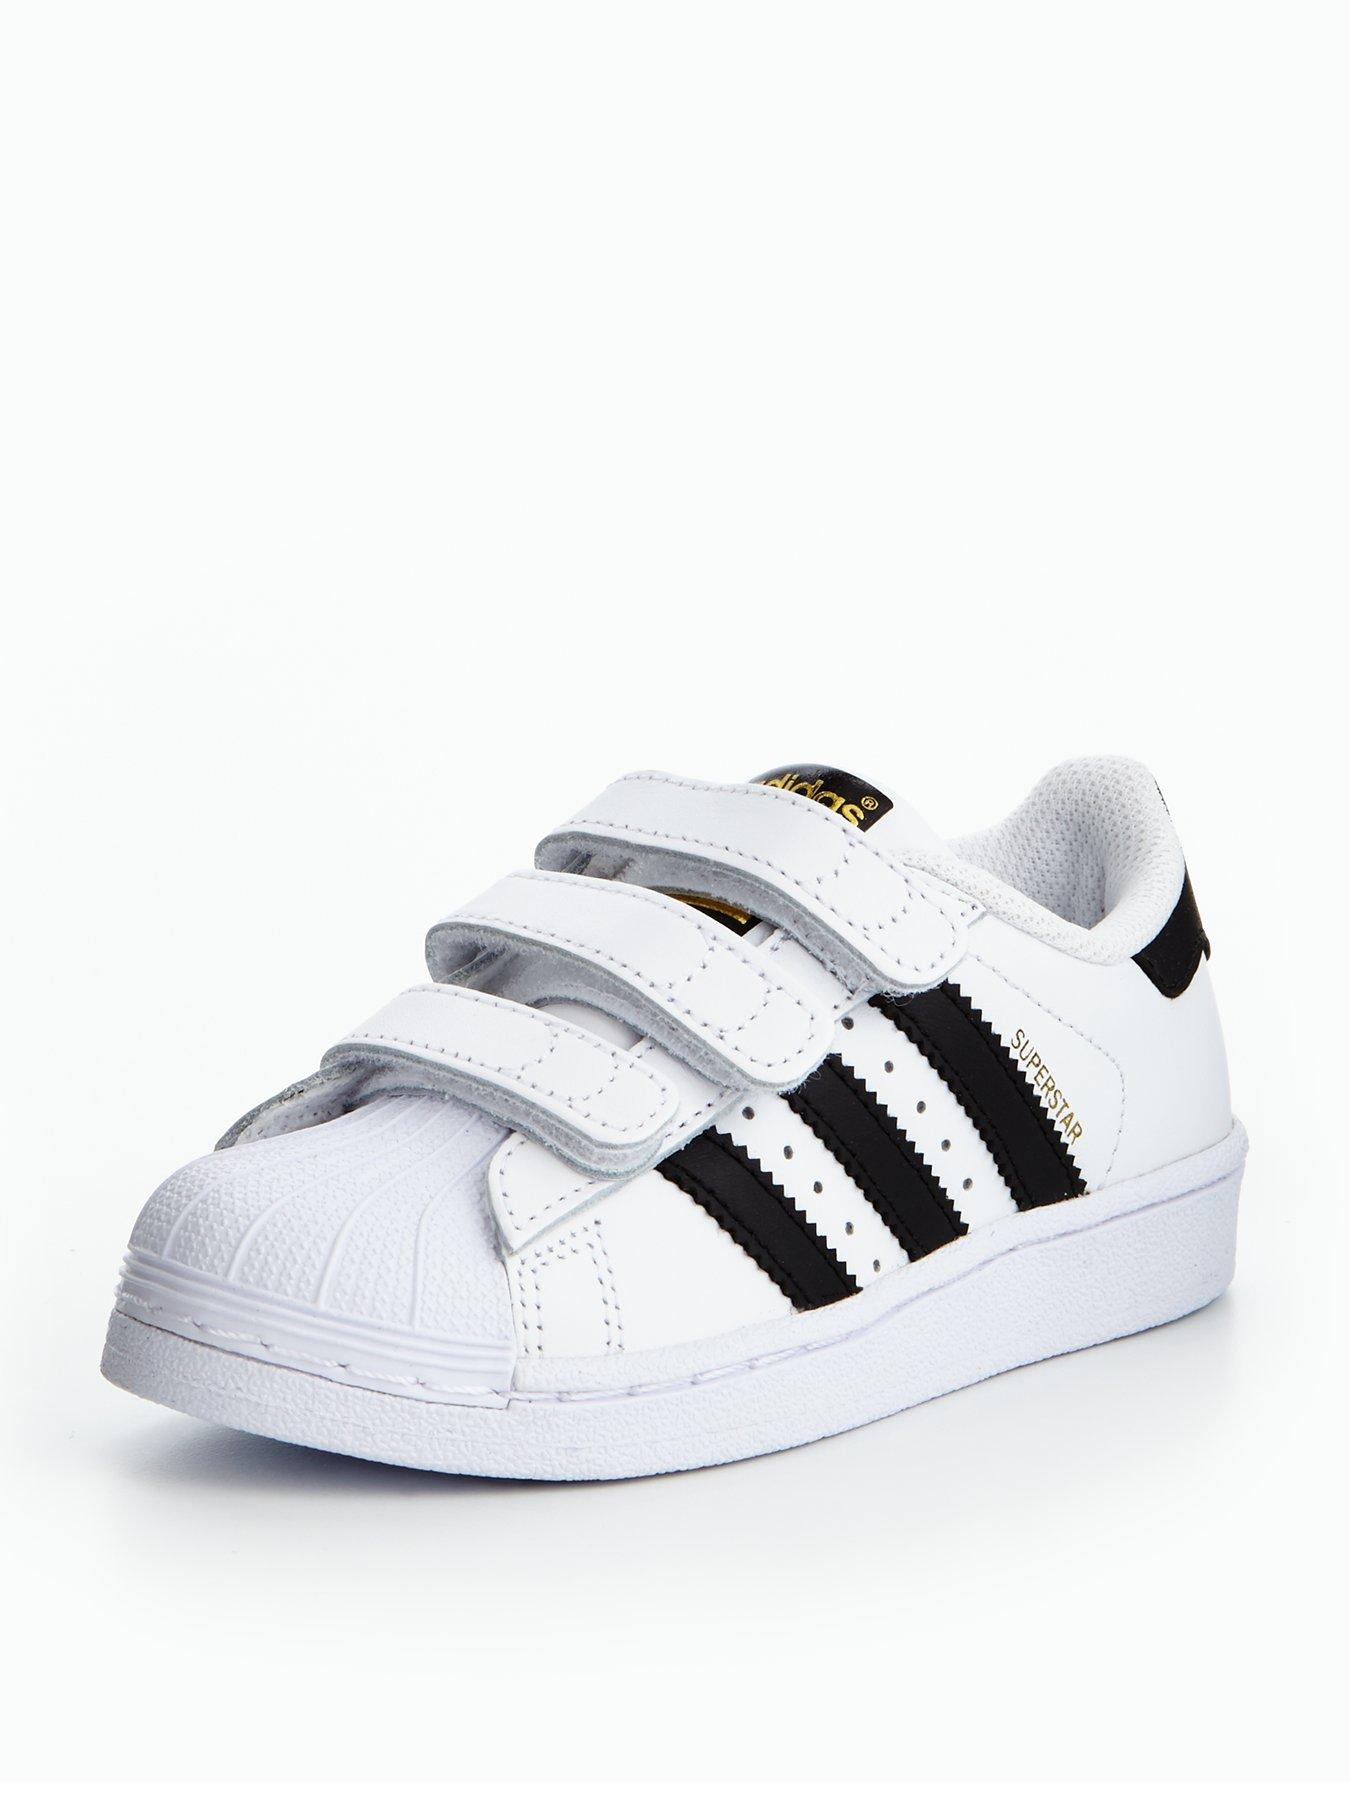 childrens adidas originals trainers